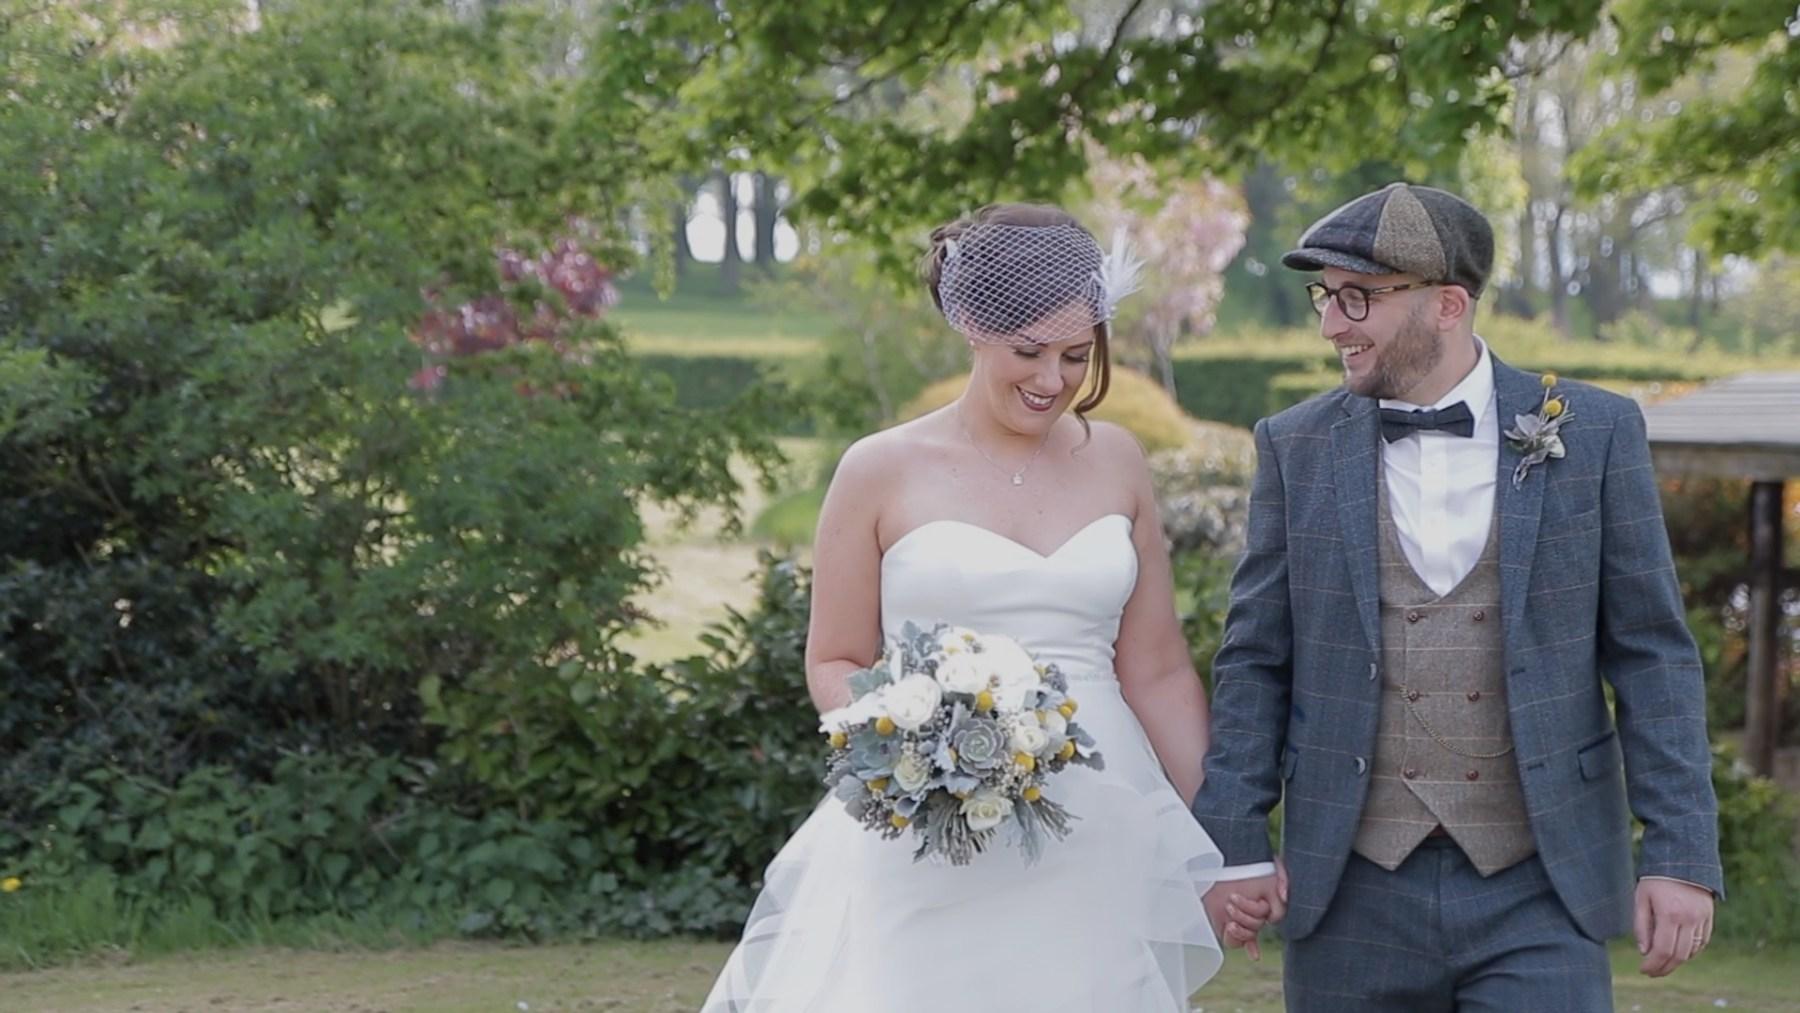 Stirk House Wedding - Bride and groom walking in gardens